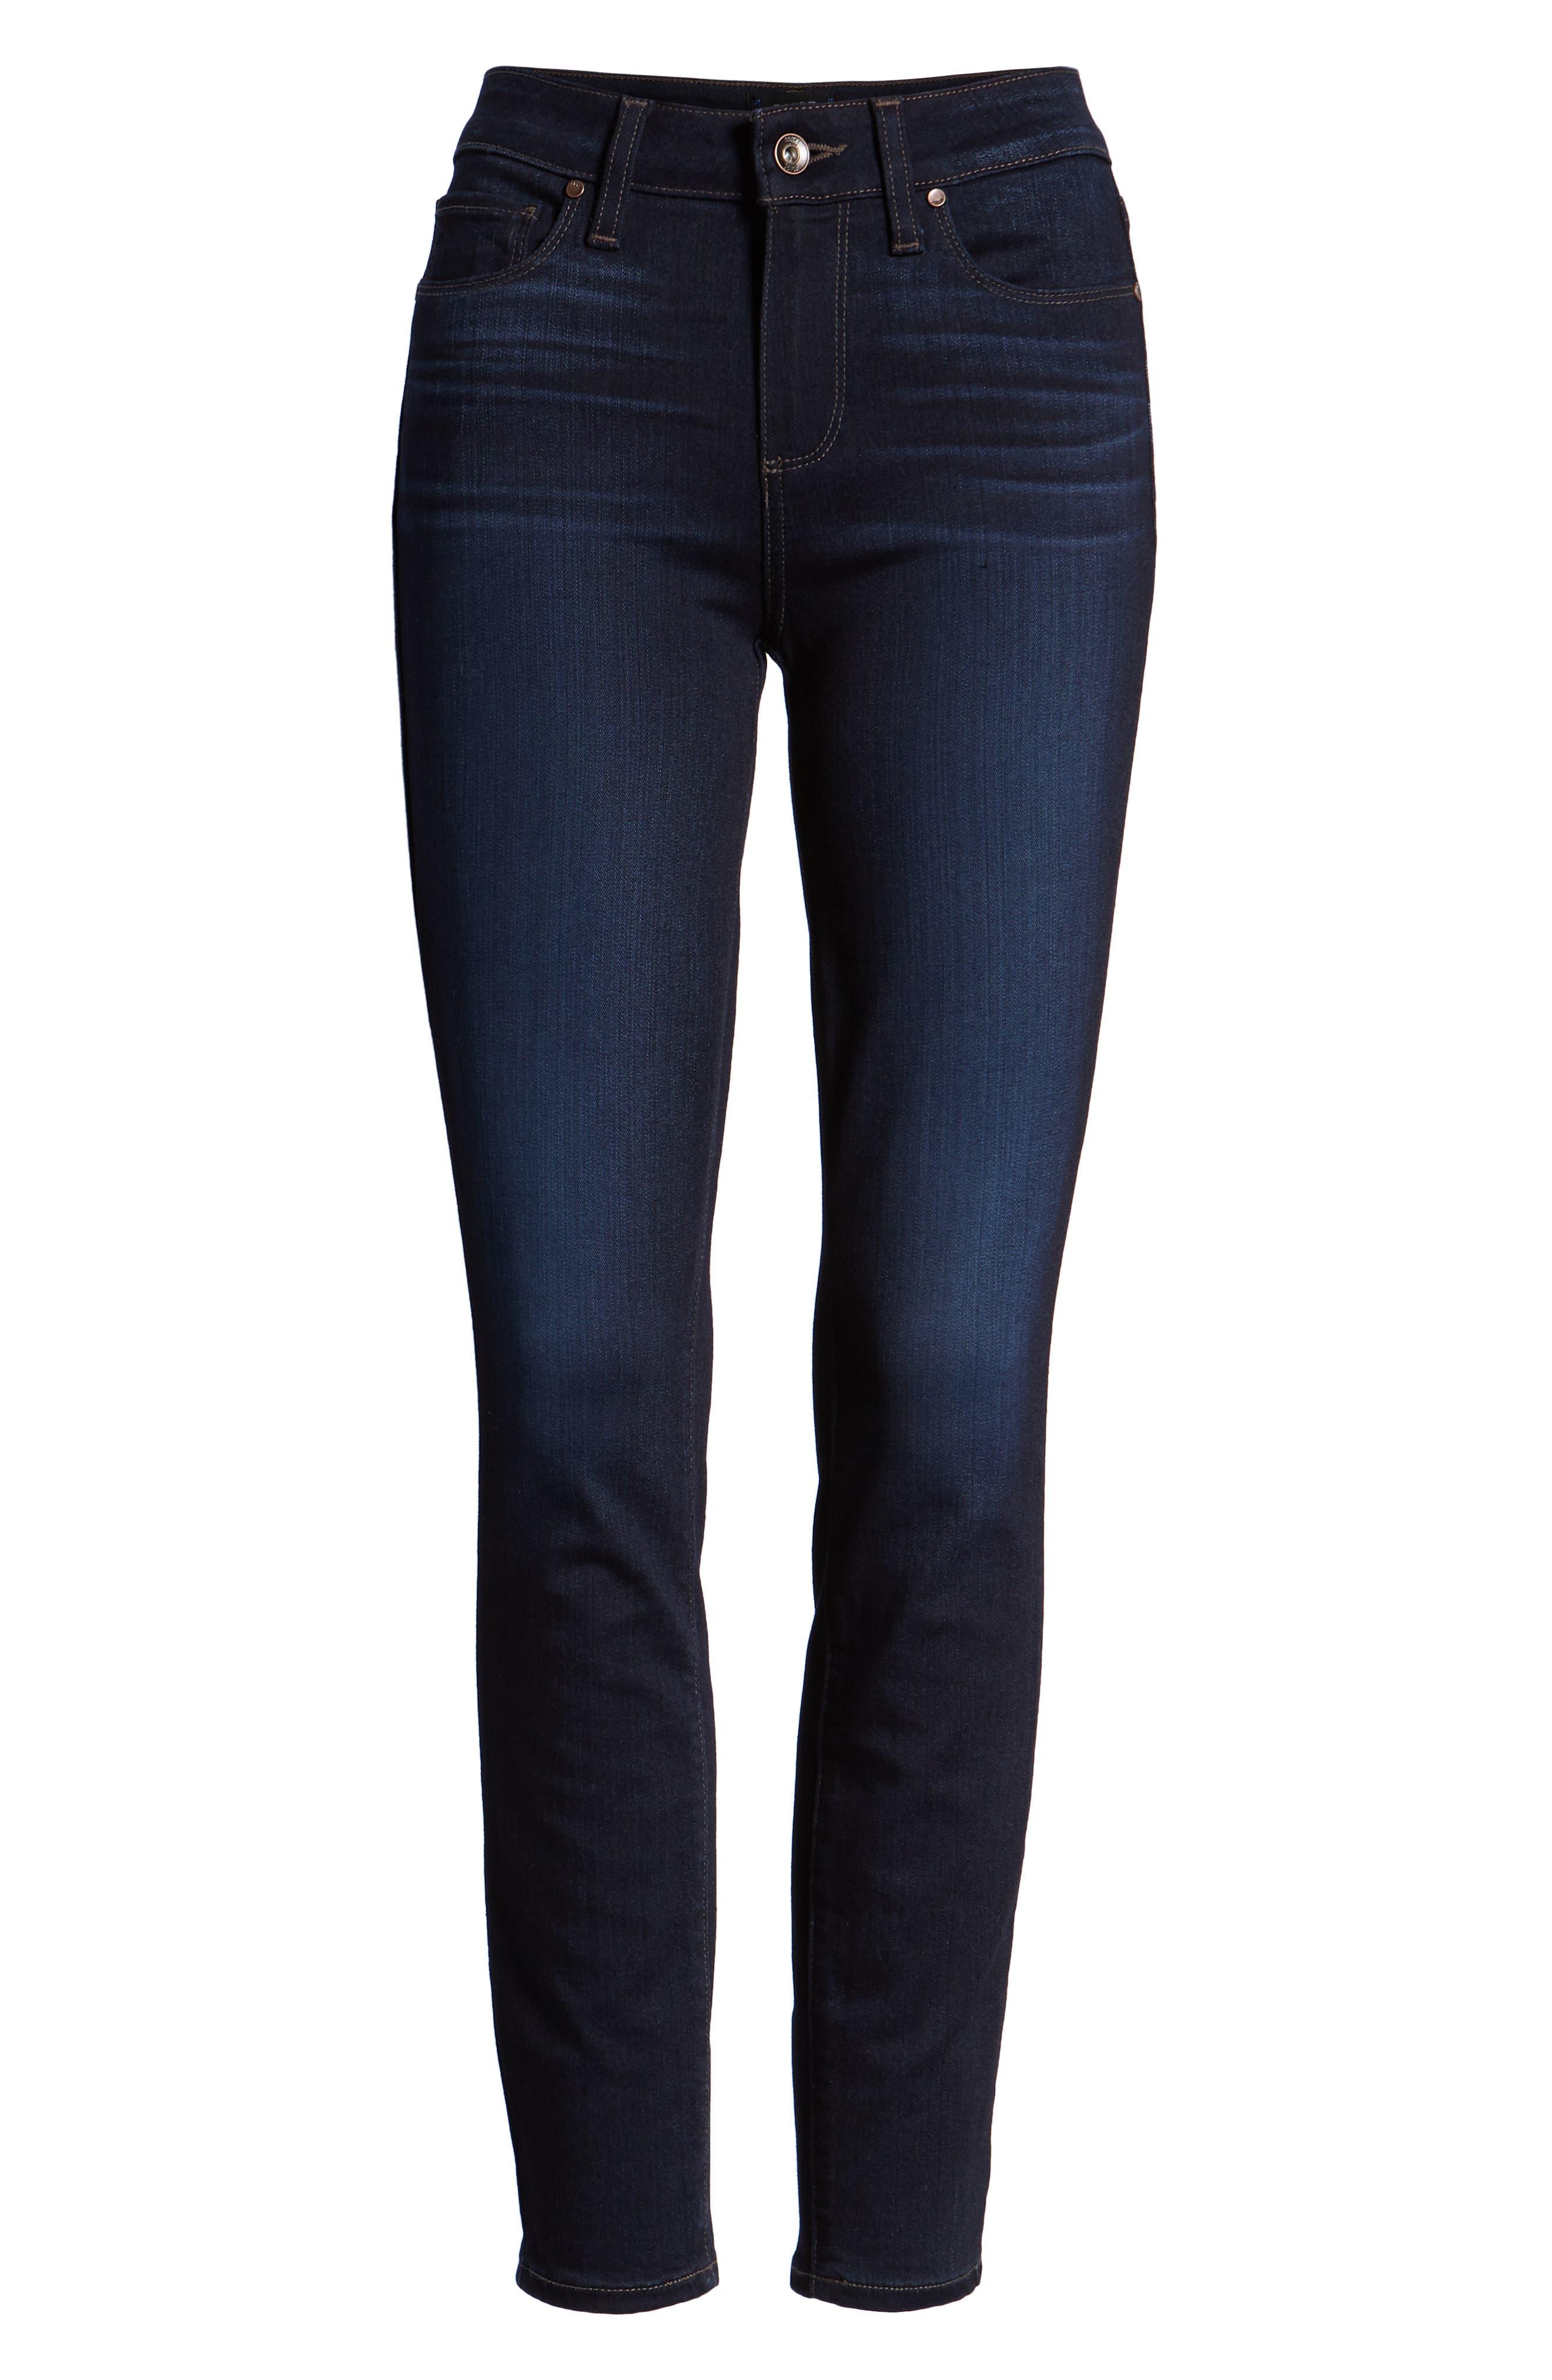 Transcend - Verdugo Ankle Skinny Jeans,                             Alternate thumbnail 7, color,                             RENNA